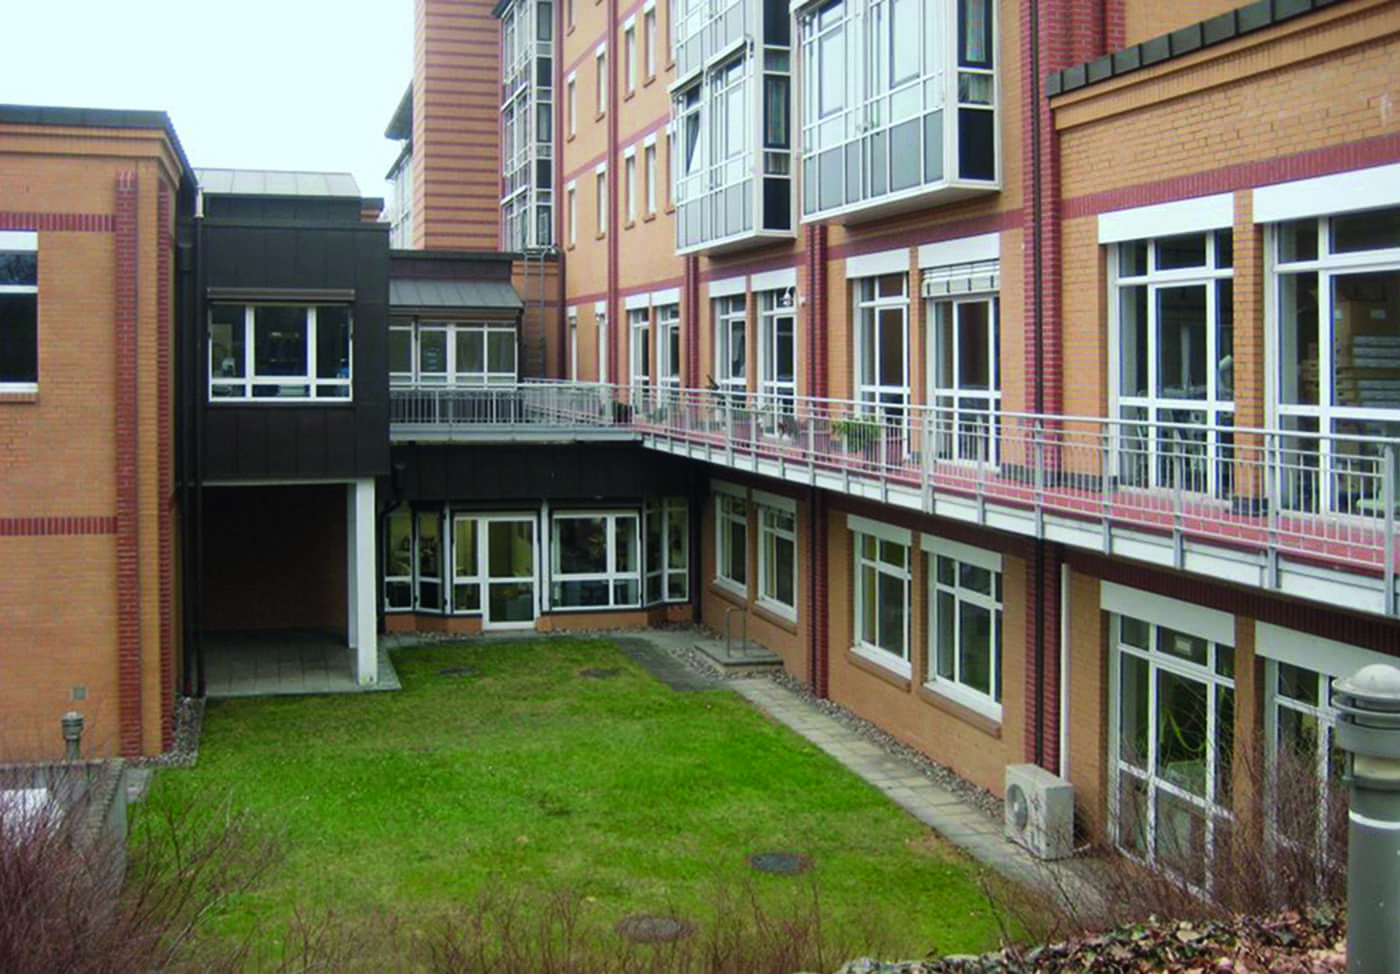 Immanuel Klinikum, Bernau Herzzentrum Brandenburg - Bild 2